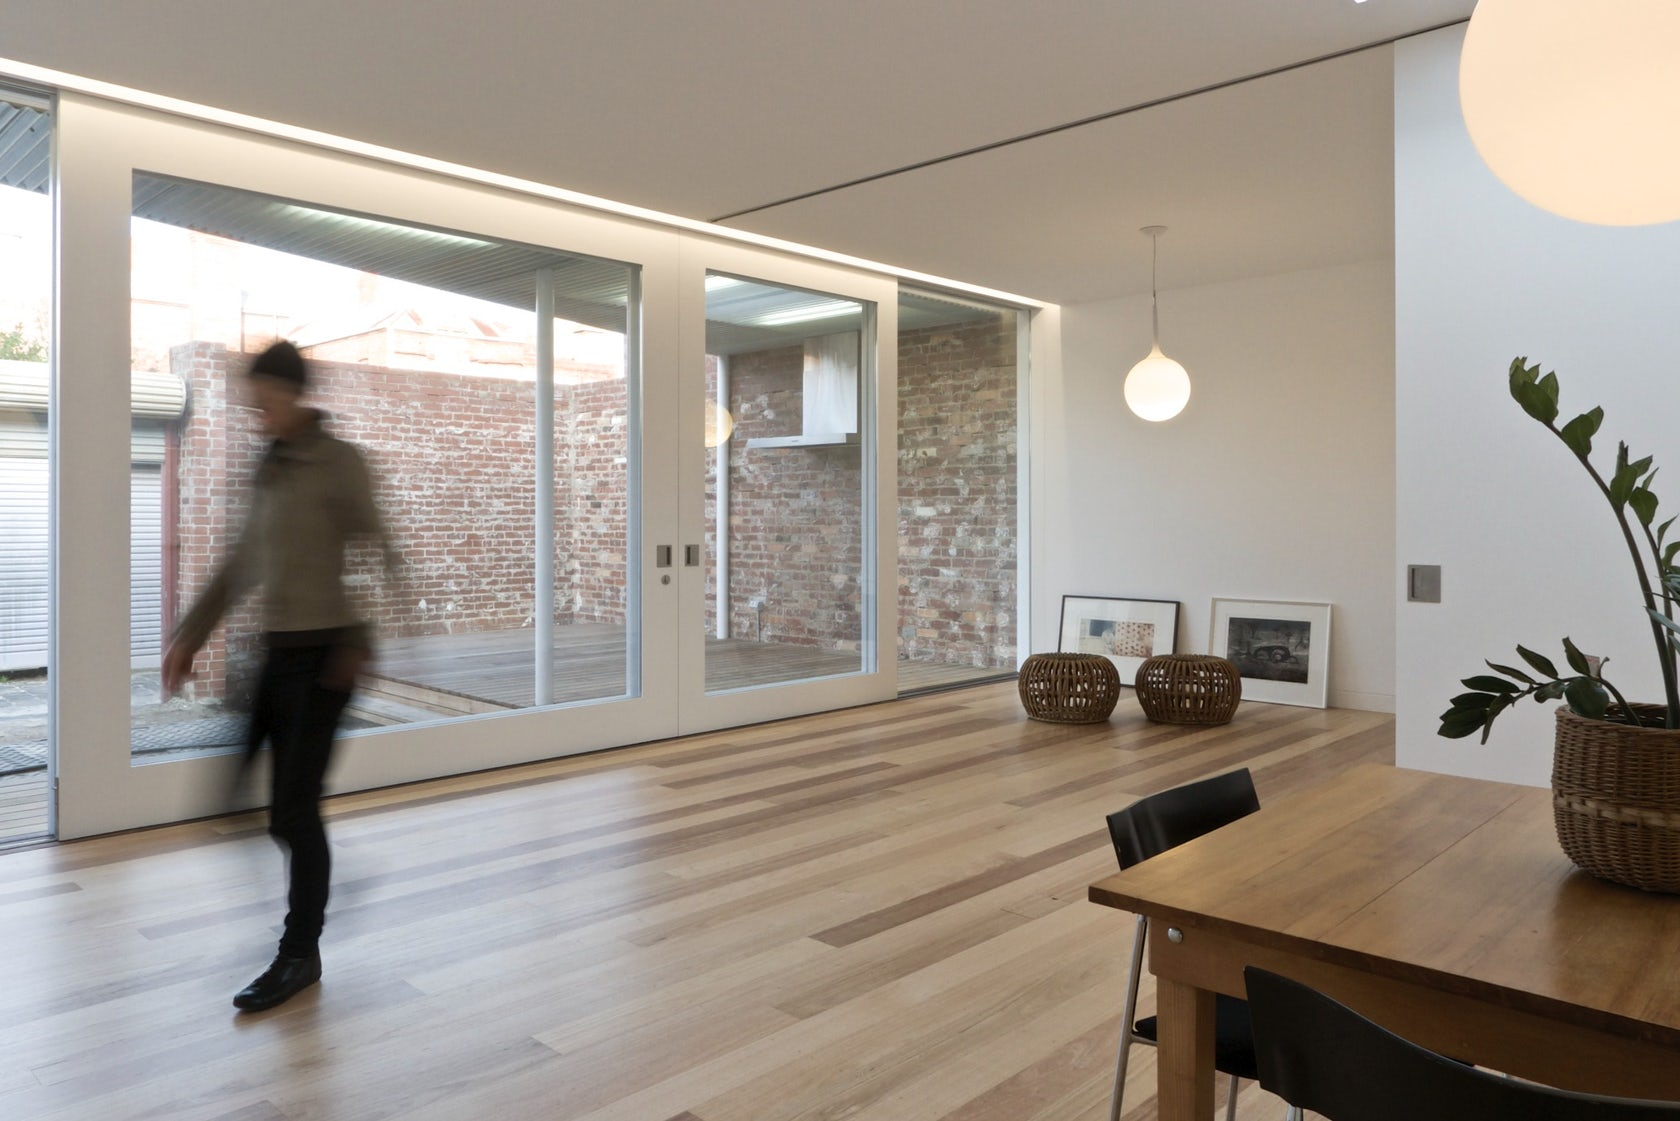 Open studio pty ltd architecture architizer for Architecture design studio pty ltd